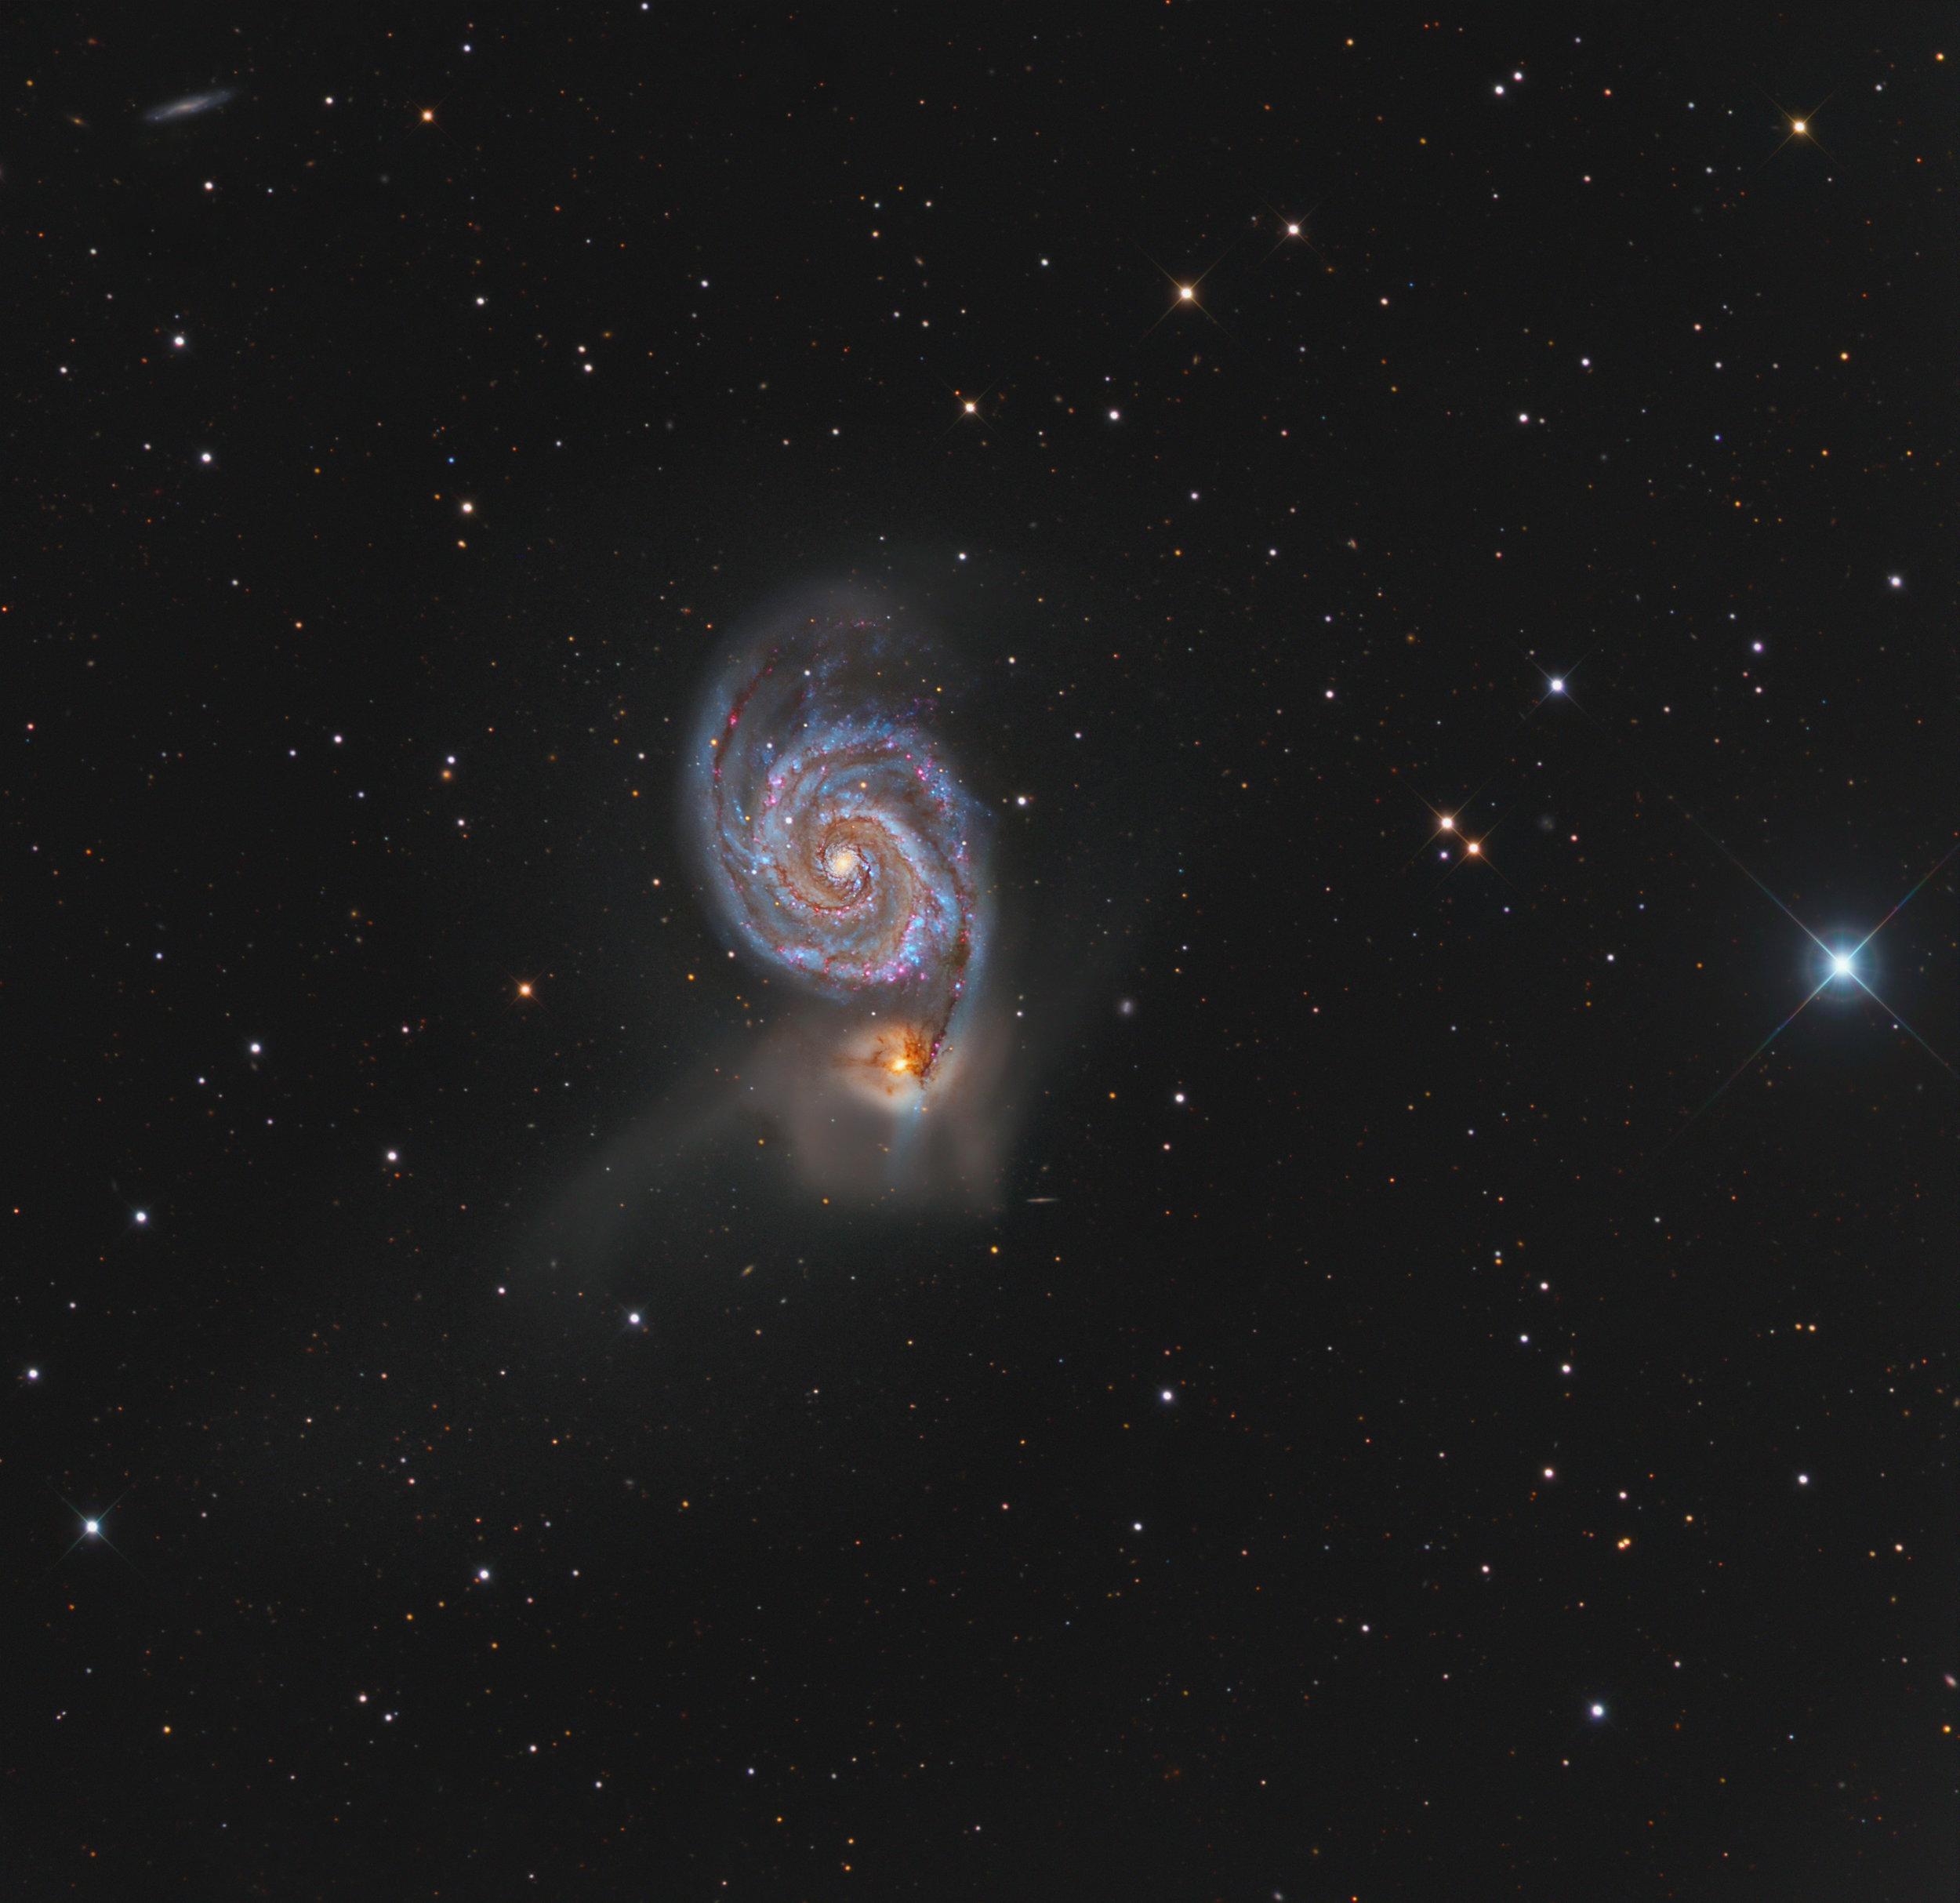 M51 From 14.5RC Rancho Hidalgo